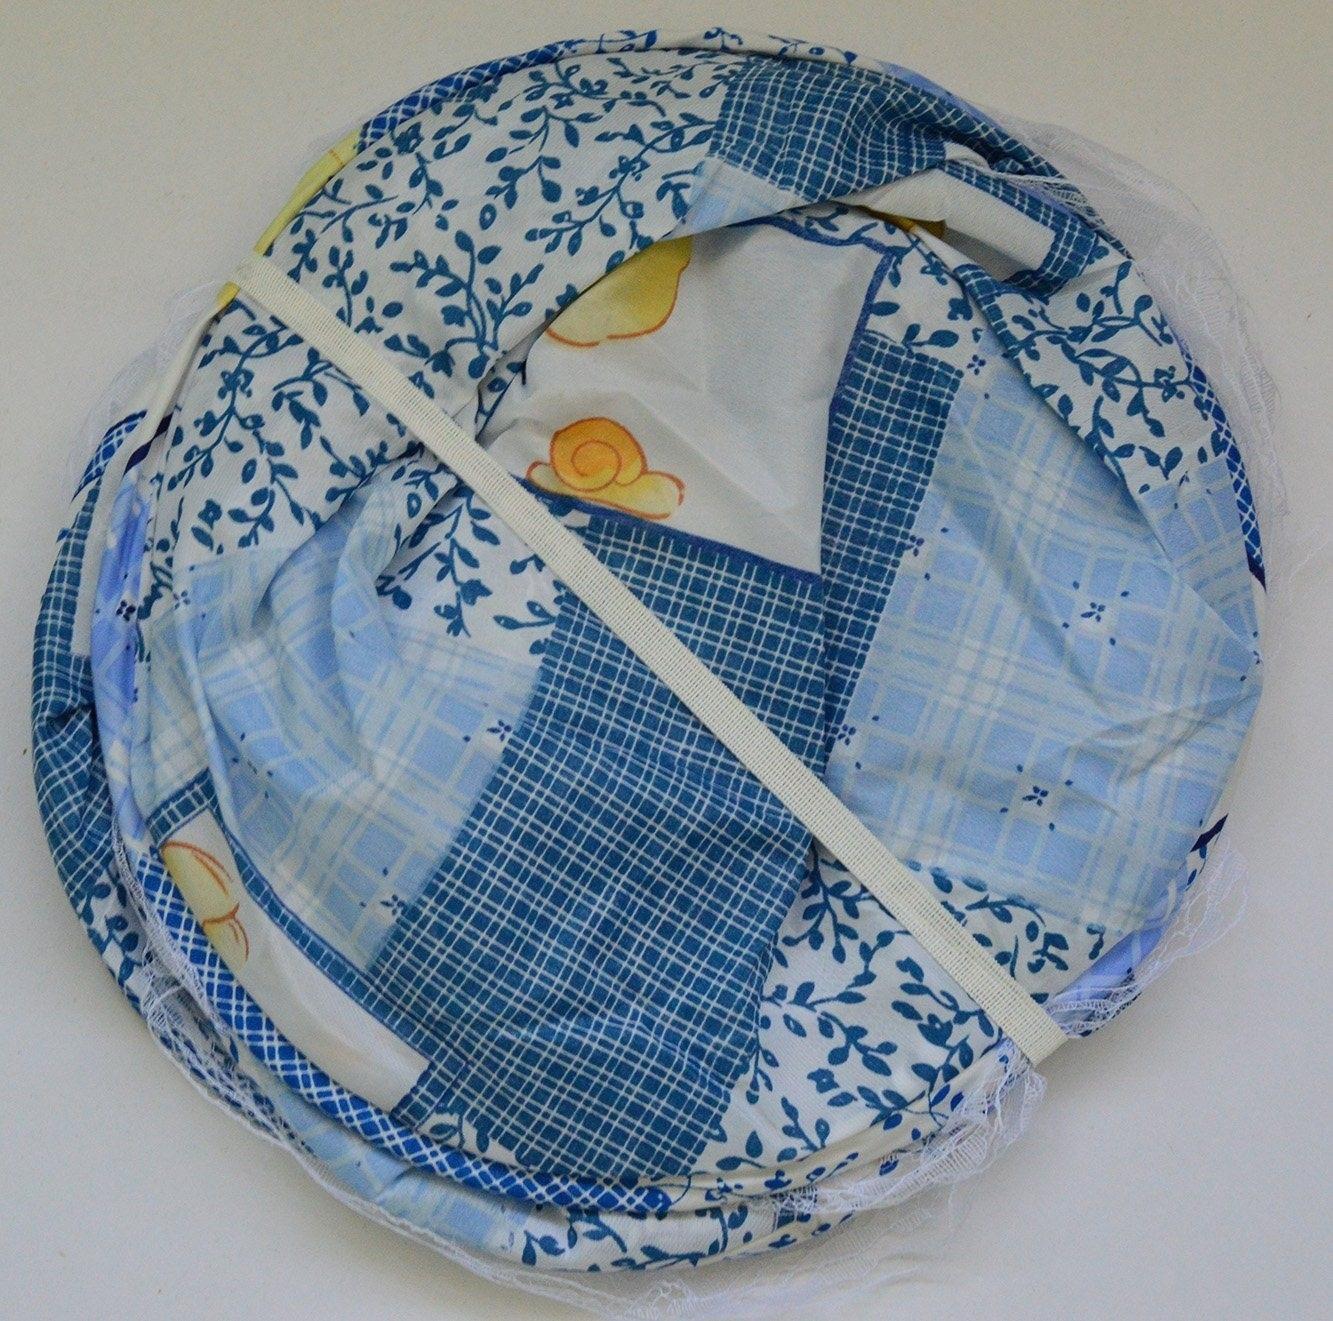 Http List Item Cuski Kids Orthopaedic Pillow Nuby Stainless Mug With Lid 240 Ml Blue Monkey 534903464 02g 0 W St G